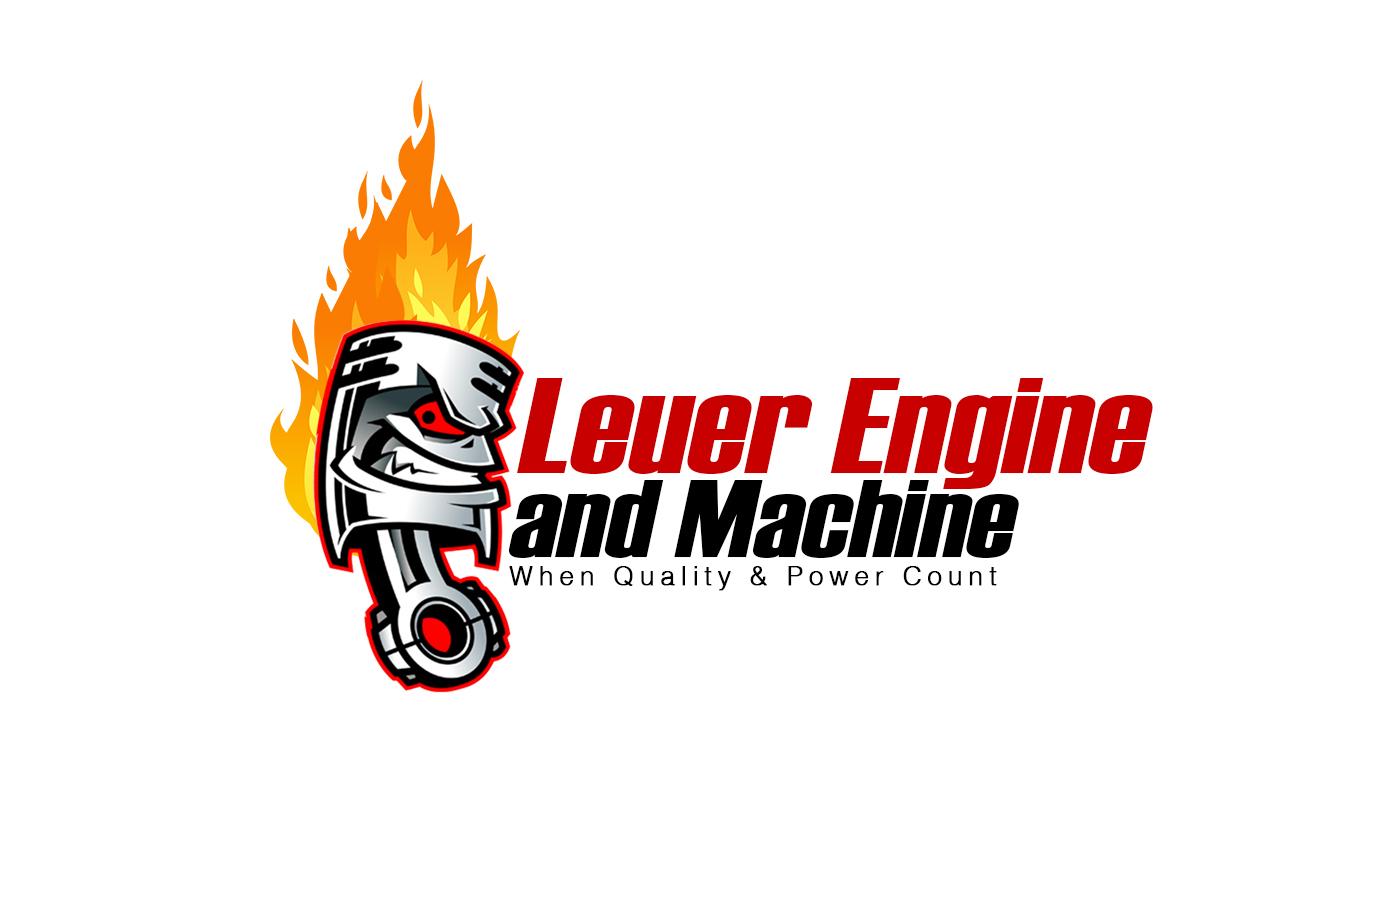 Leuer Engine and Machine, Inc